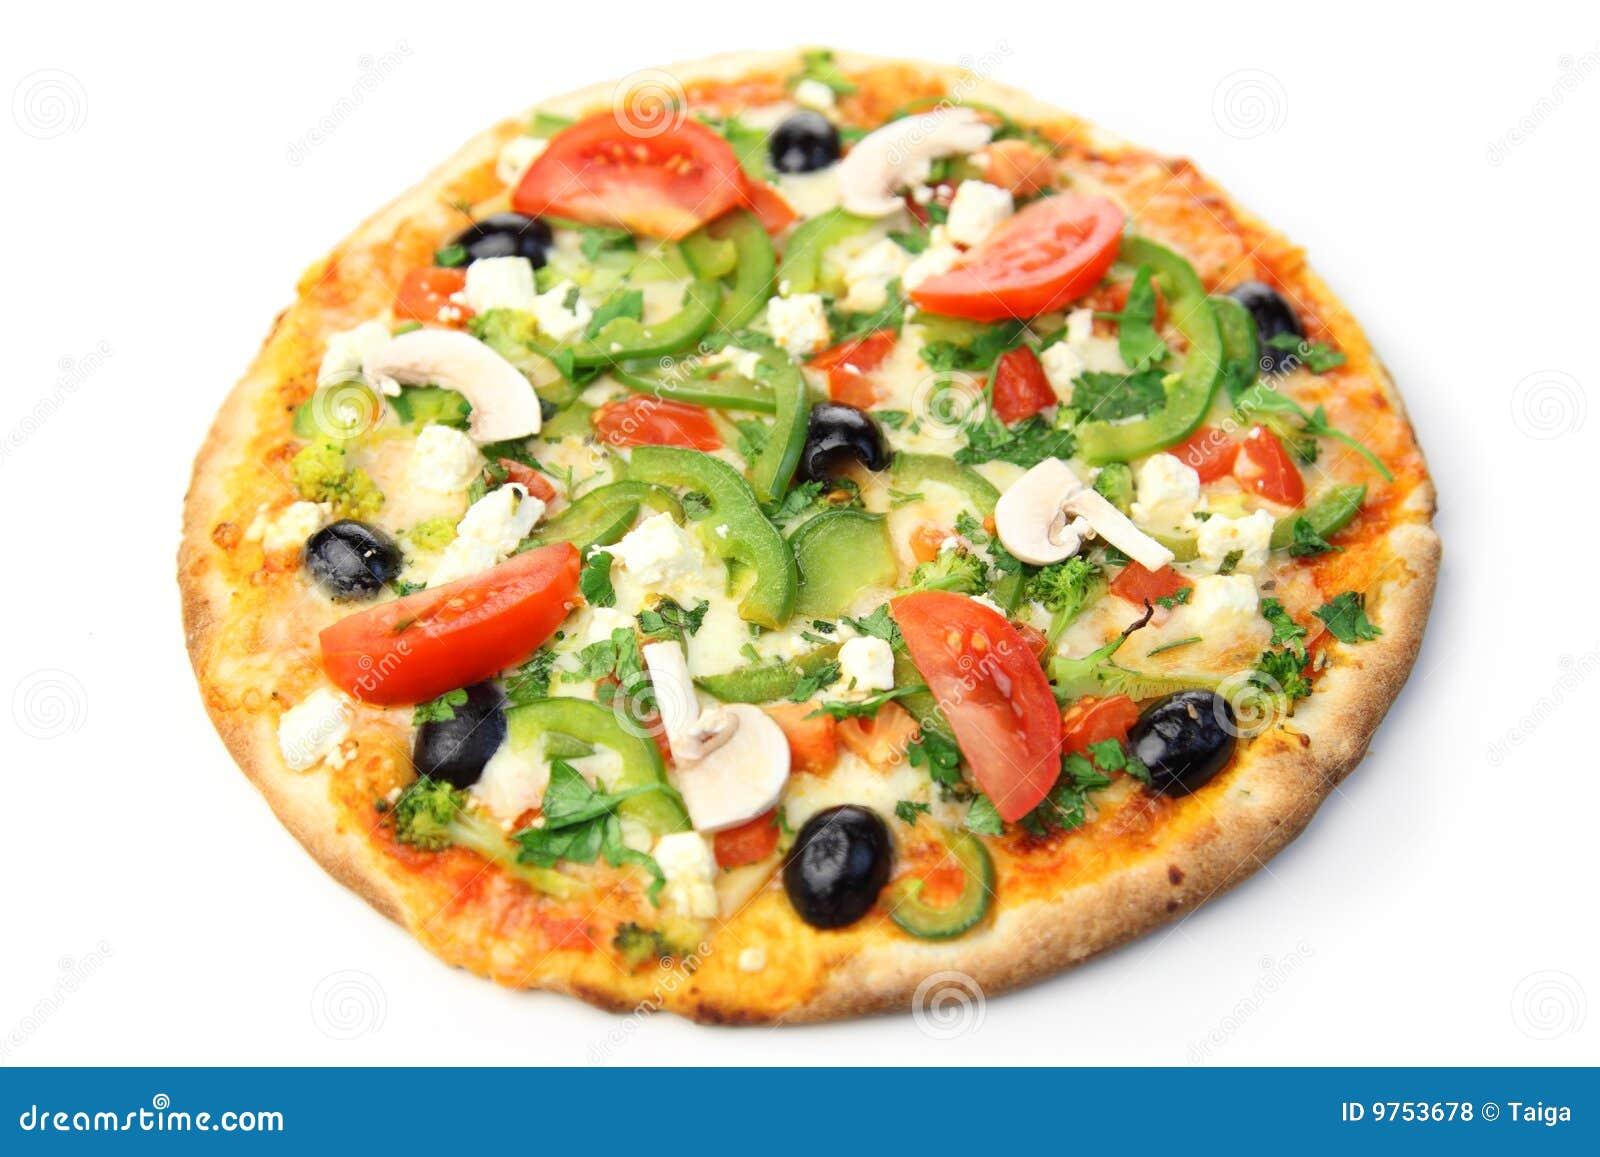 Pizza / white background